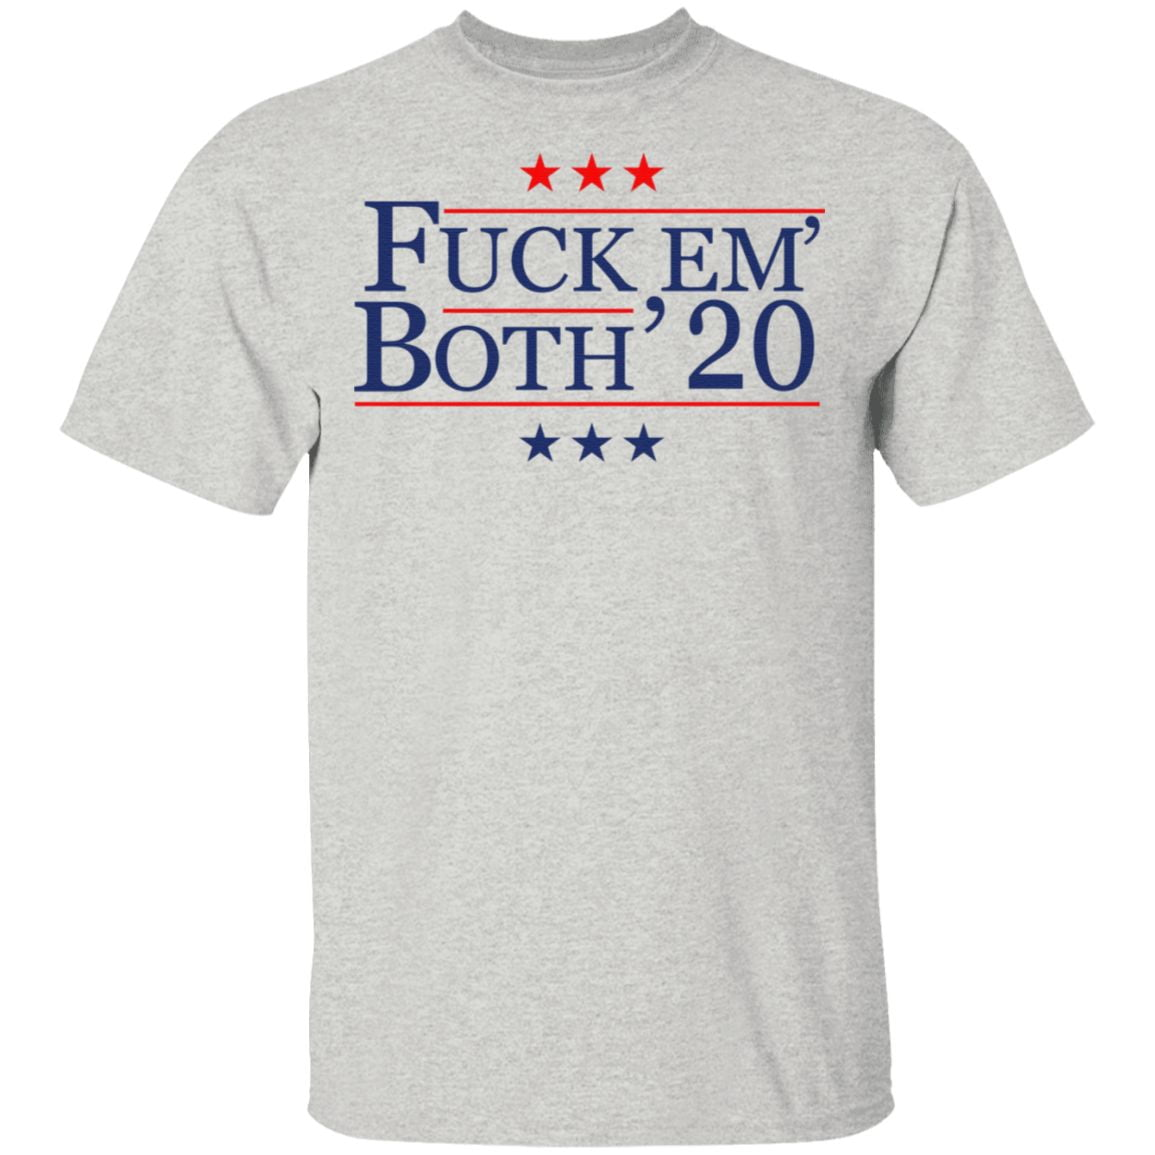 Fuck em both 2020 t shirt